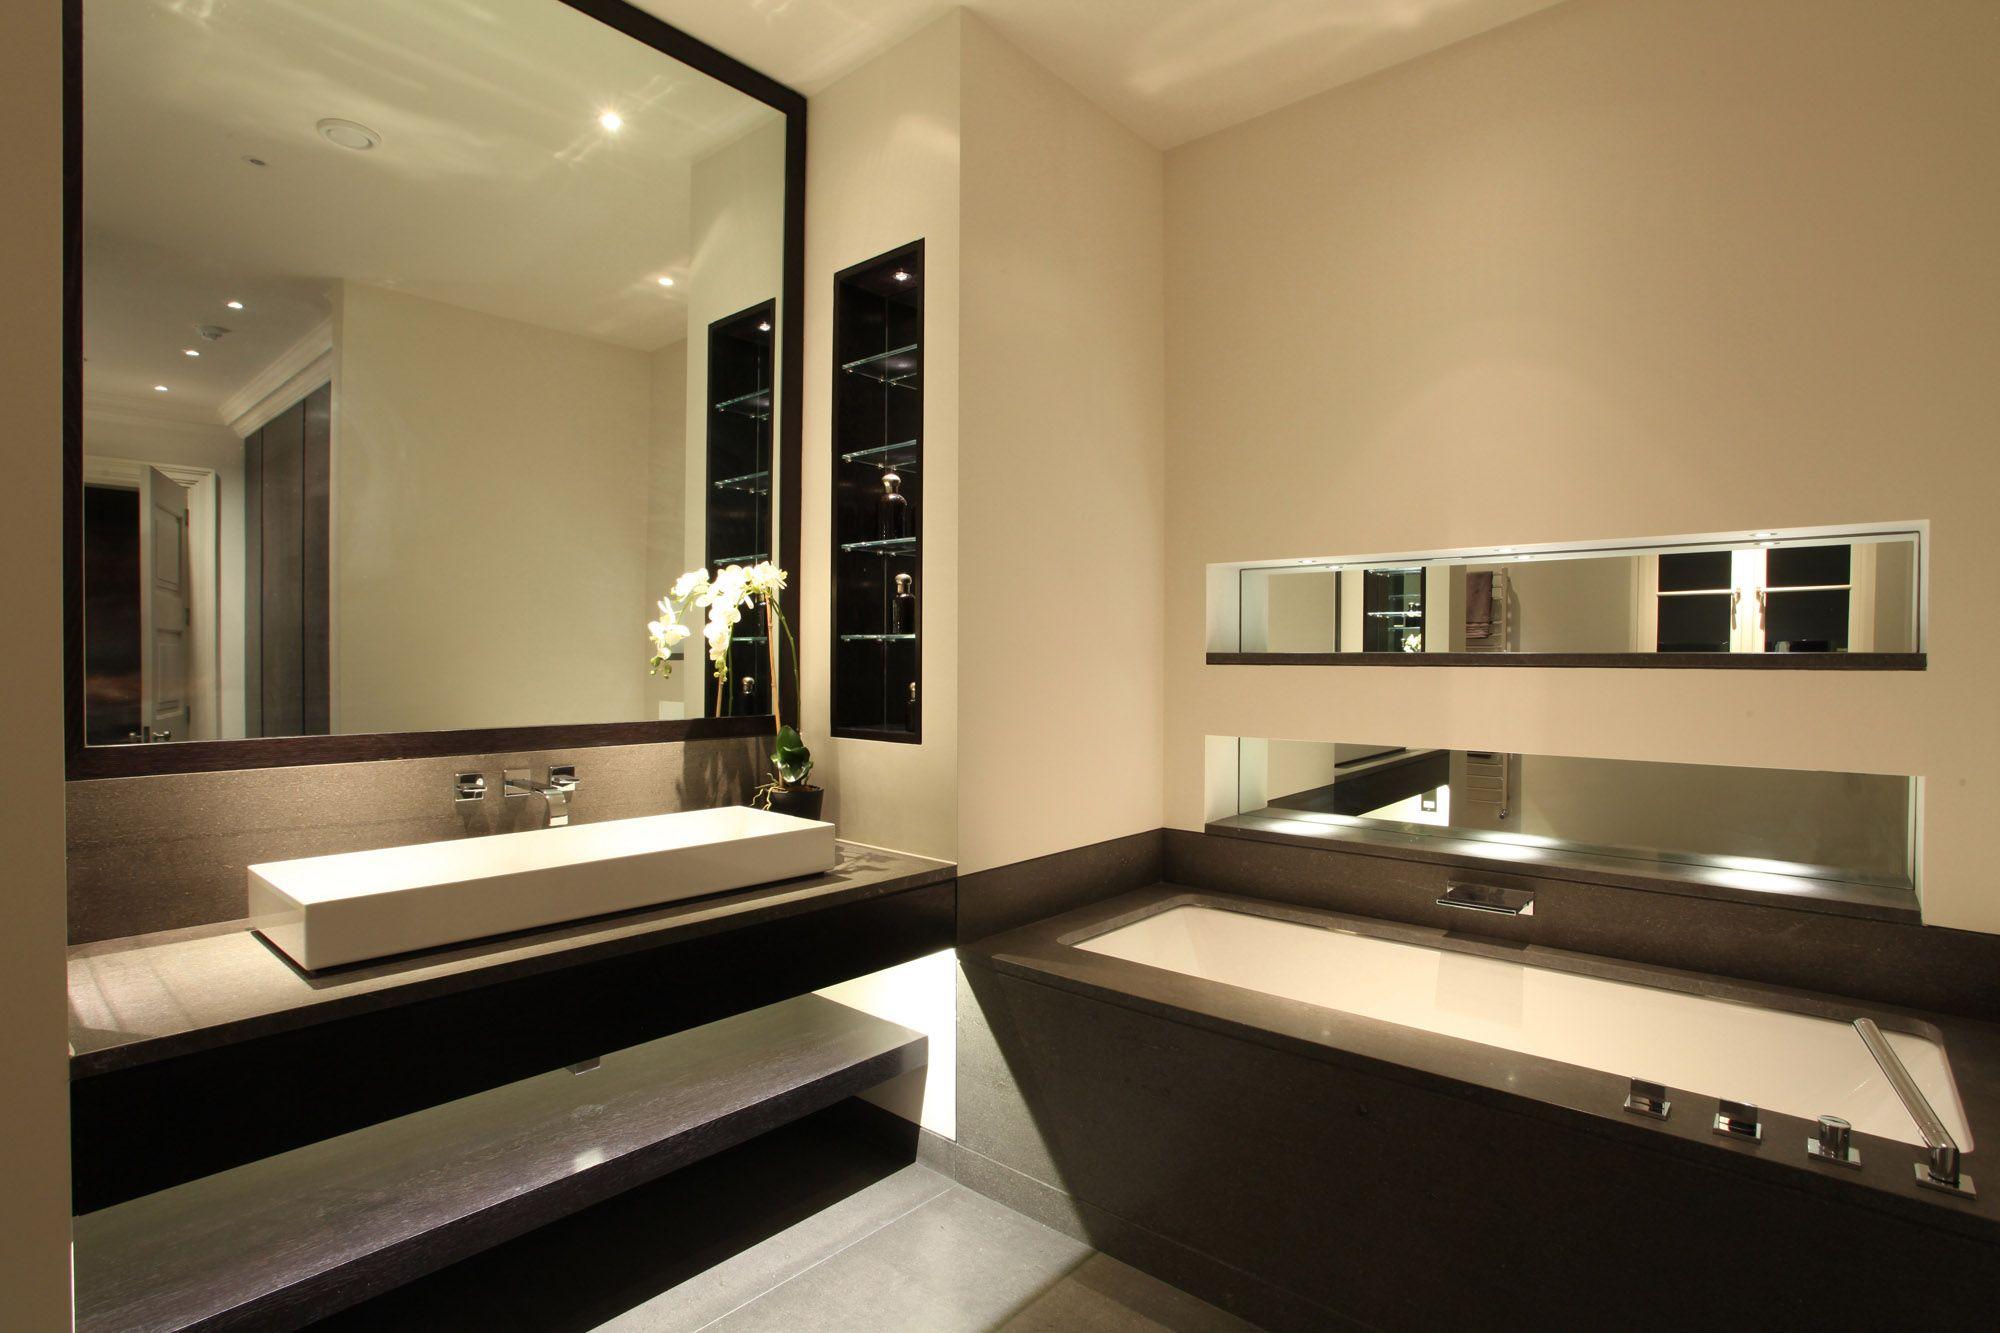 Bathroom Light Fixture Requirements bathroom light (12) | lighting | pinterest | bathroom and lights